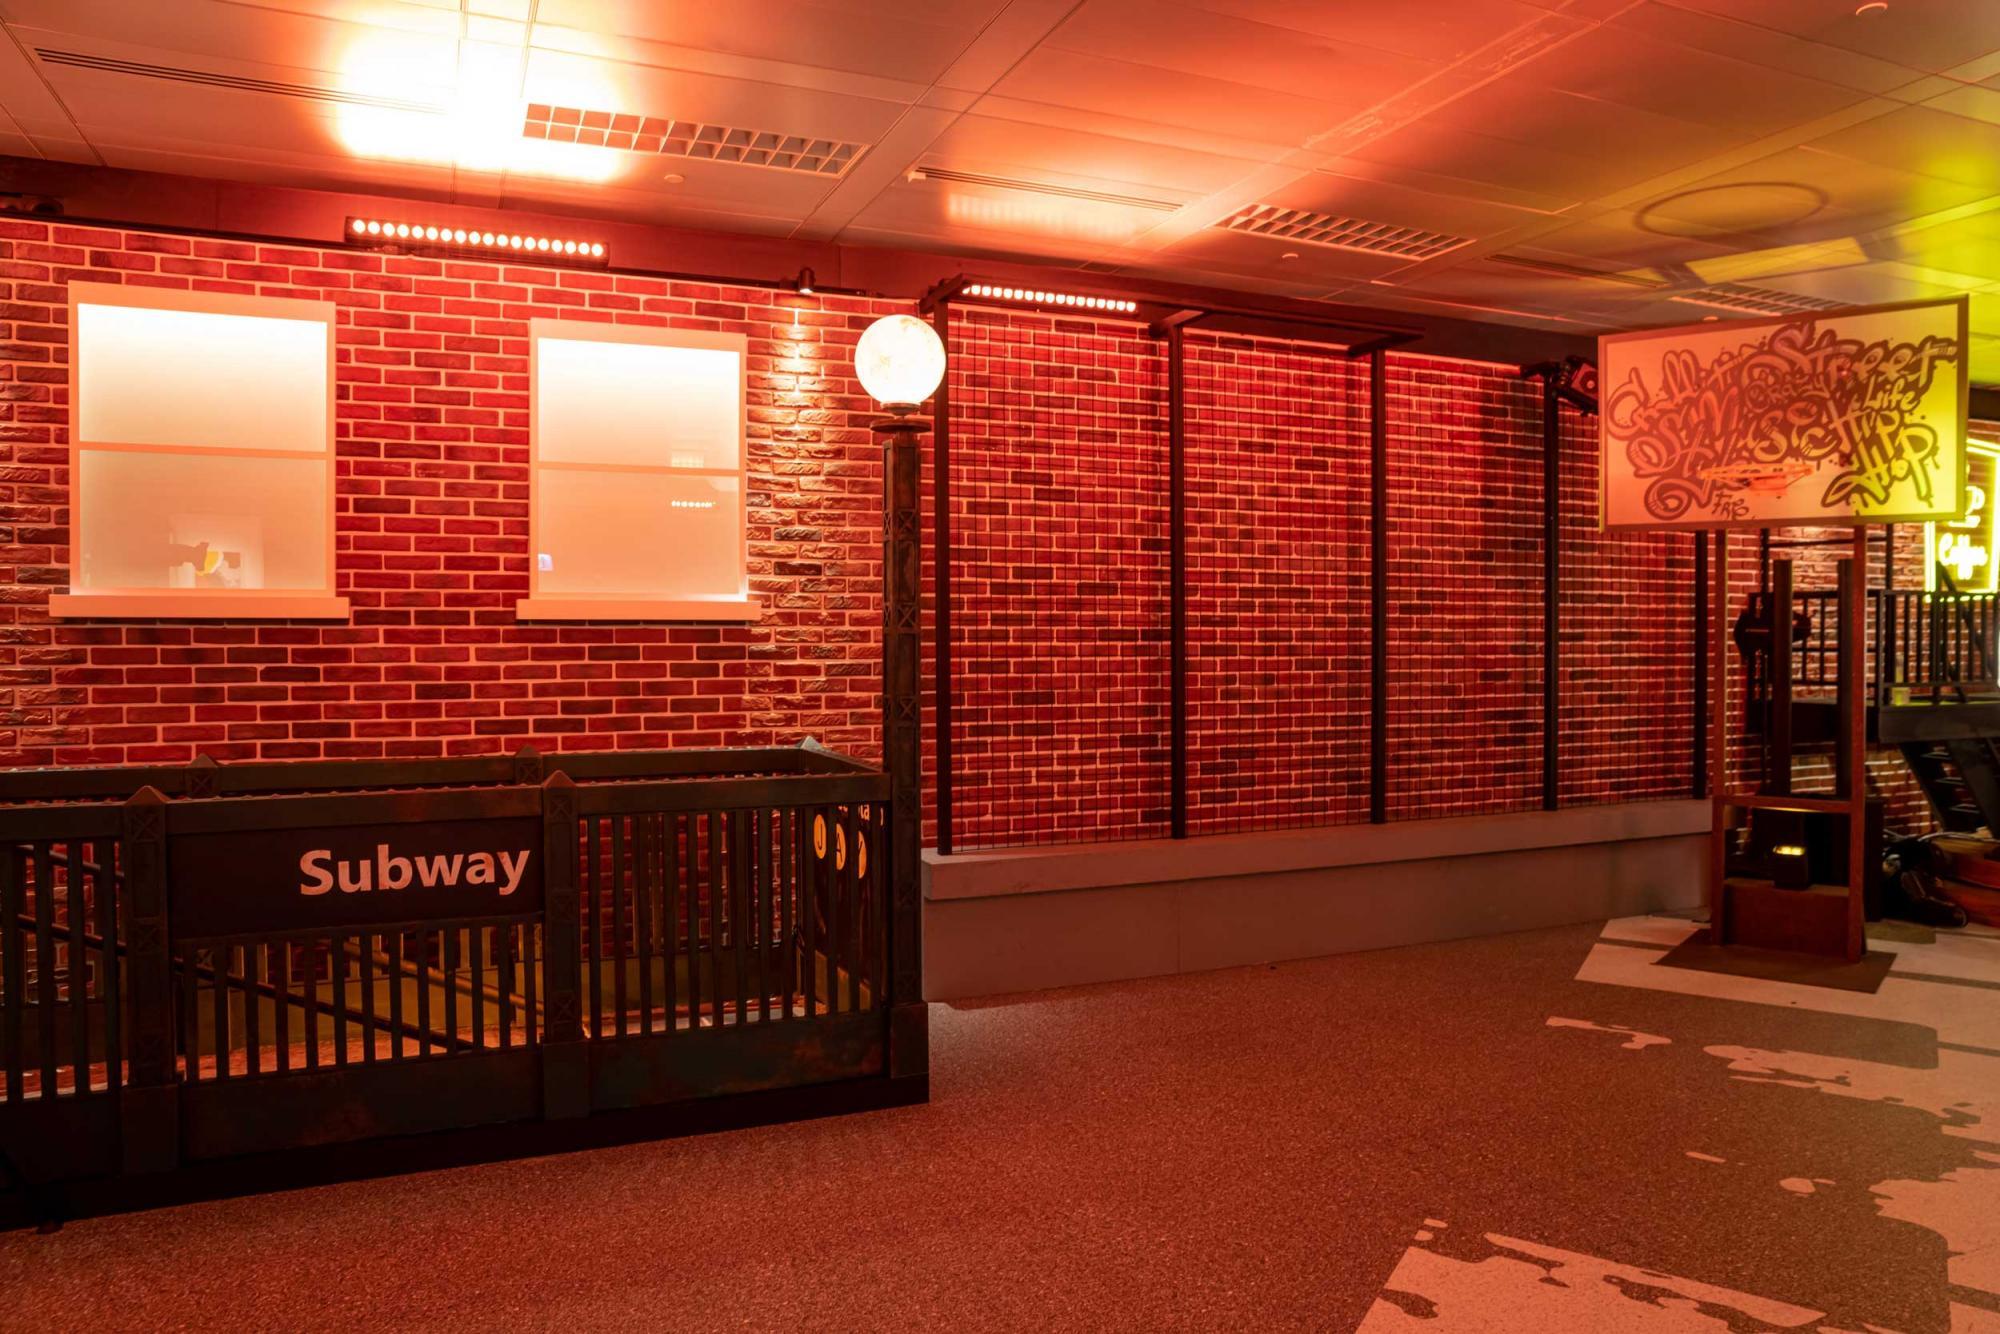 New-York-Street-Area-(5)---Subway-Station-and-Basketball-Court.jpg